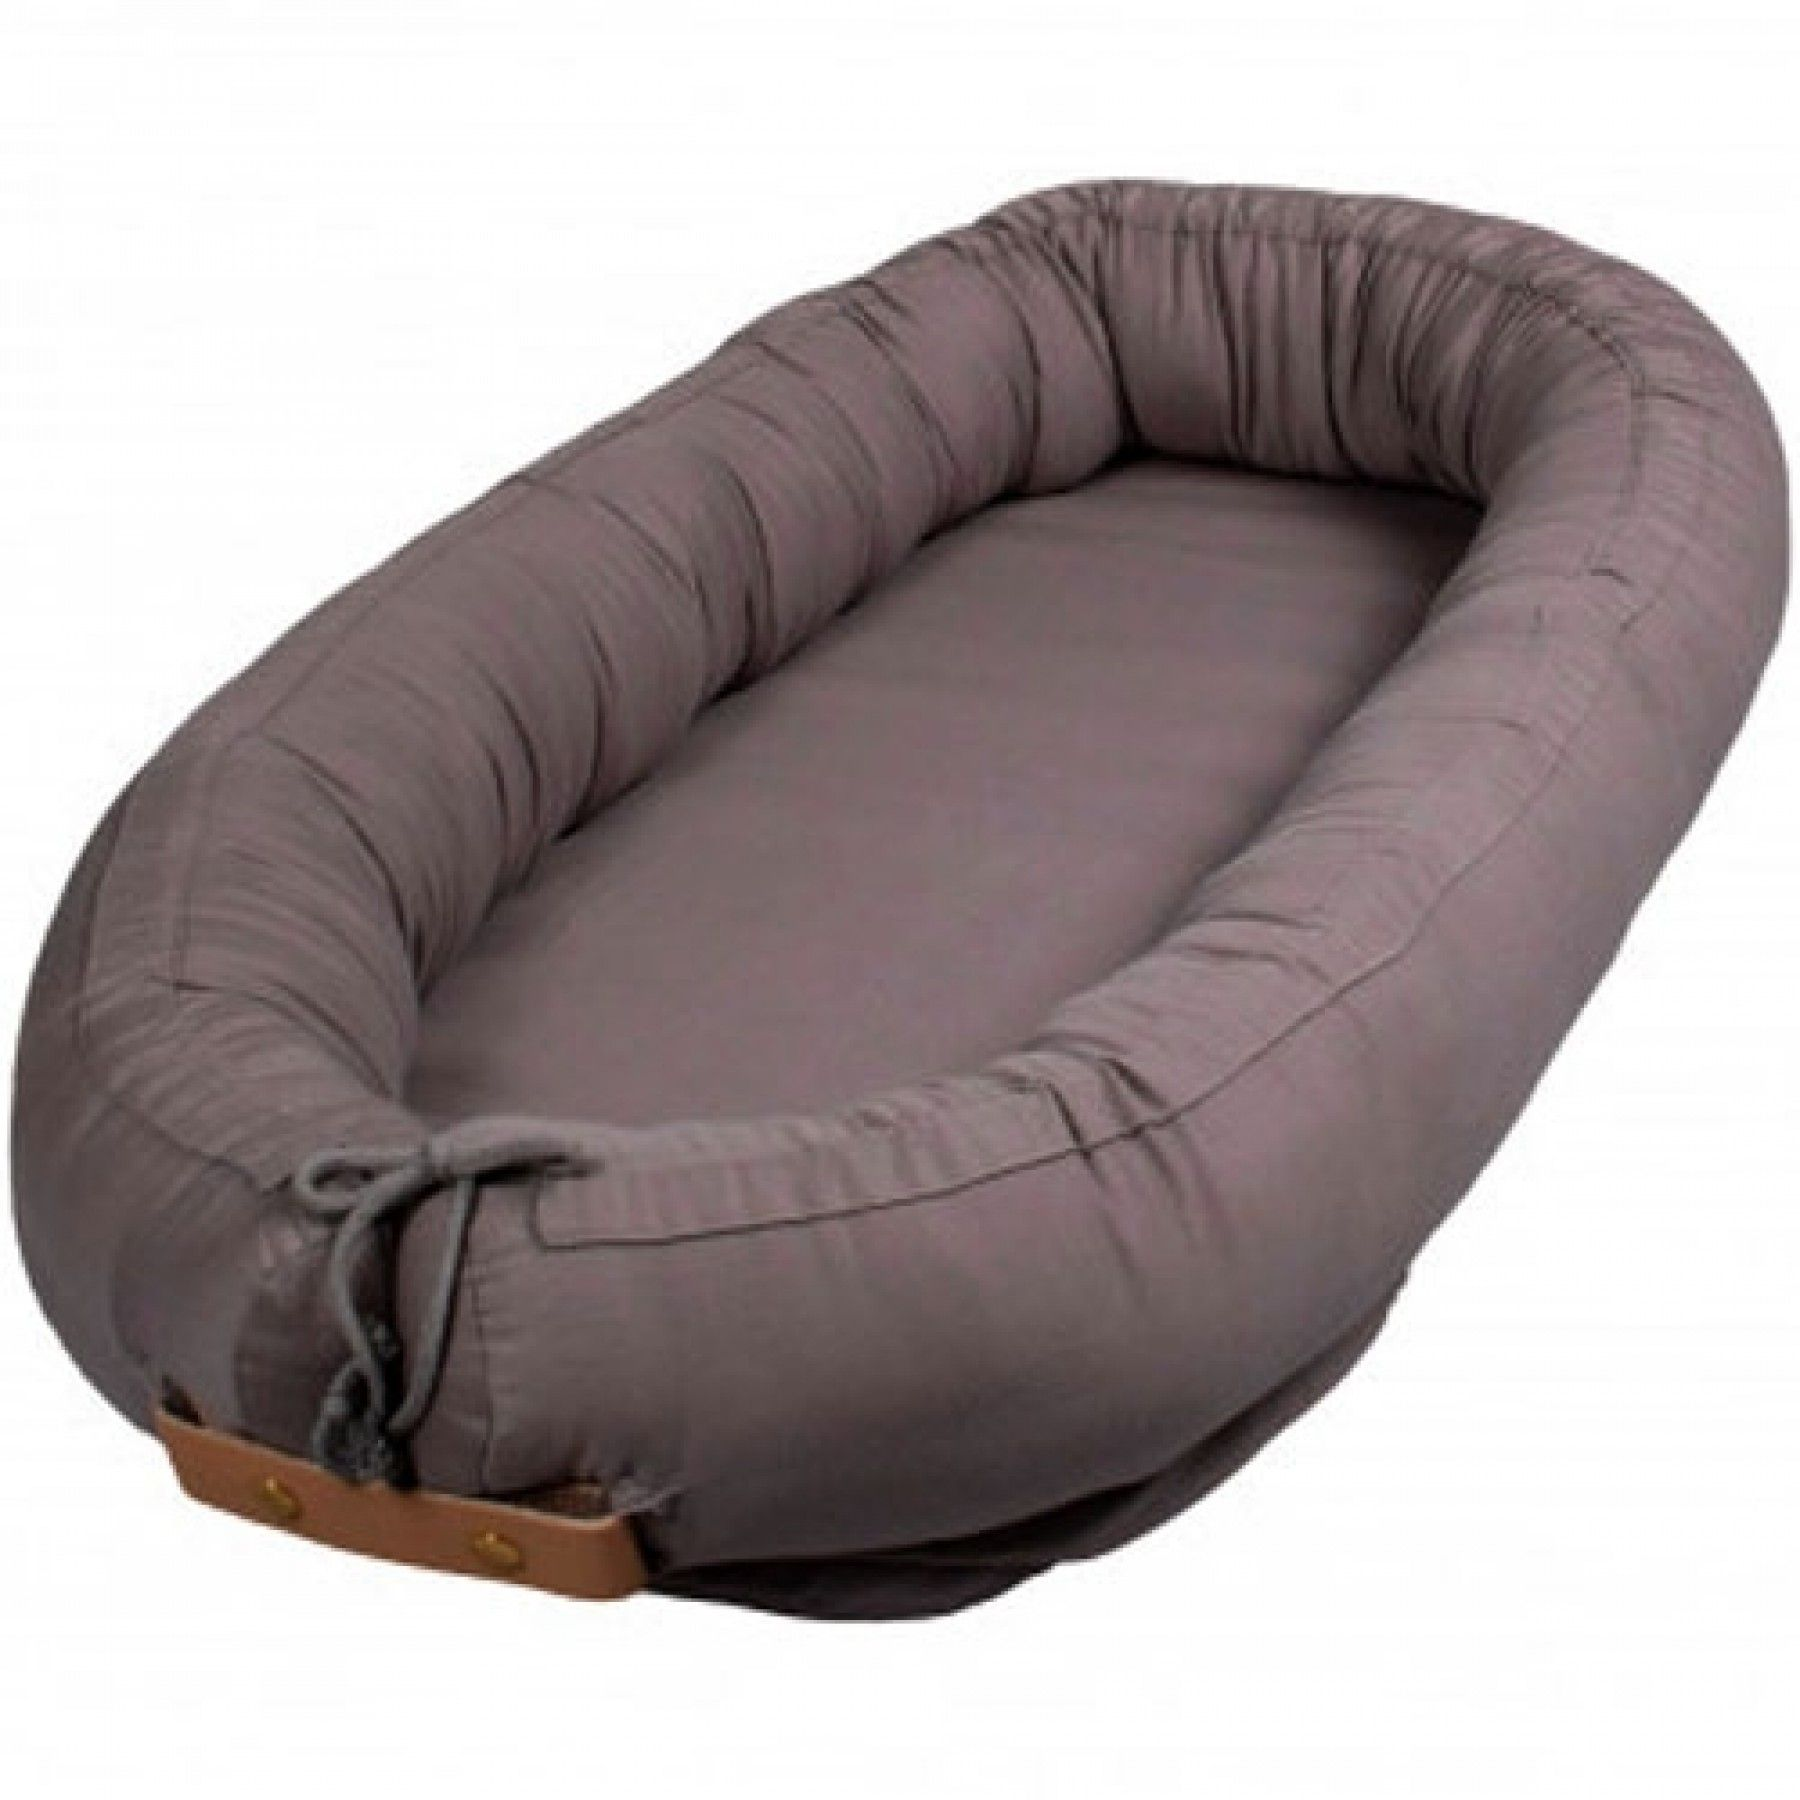 Filibabba - Premium kapok baby nest, Grey (FI-K010)